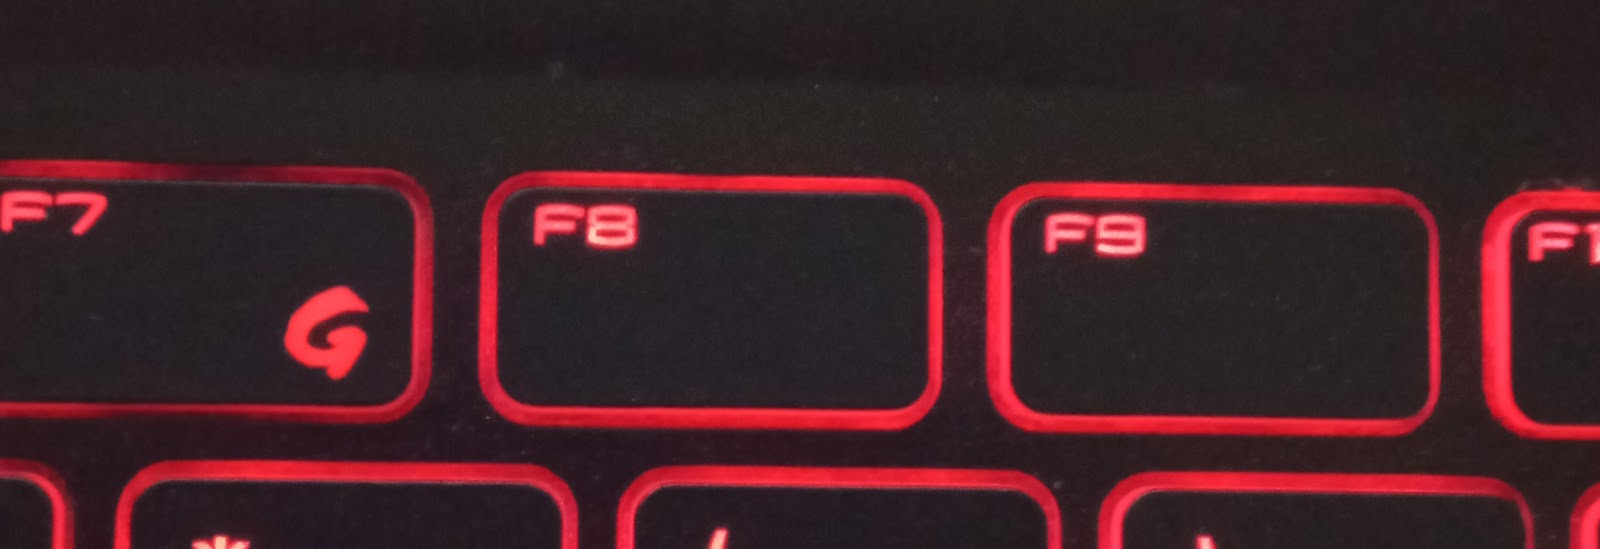 F8 button